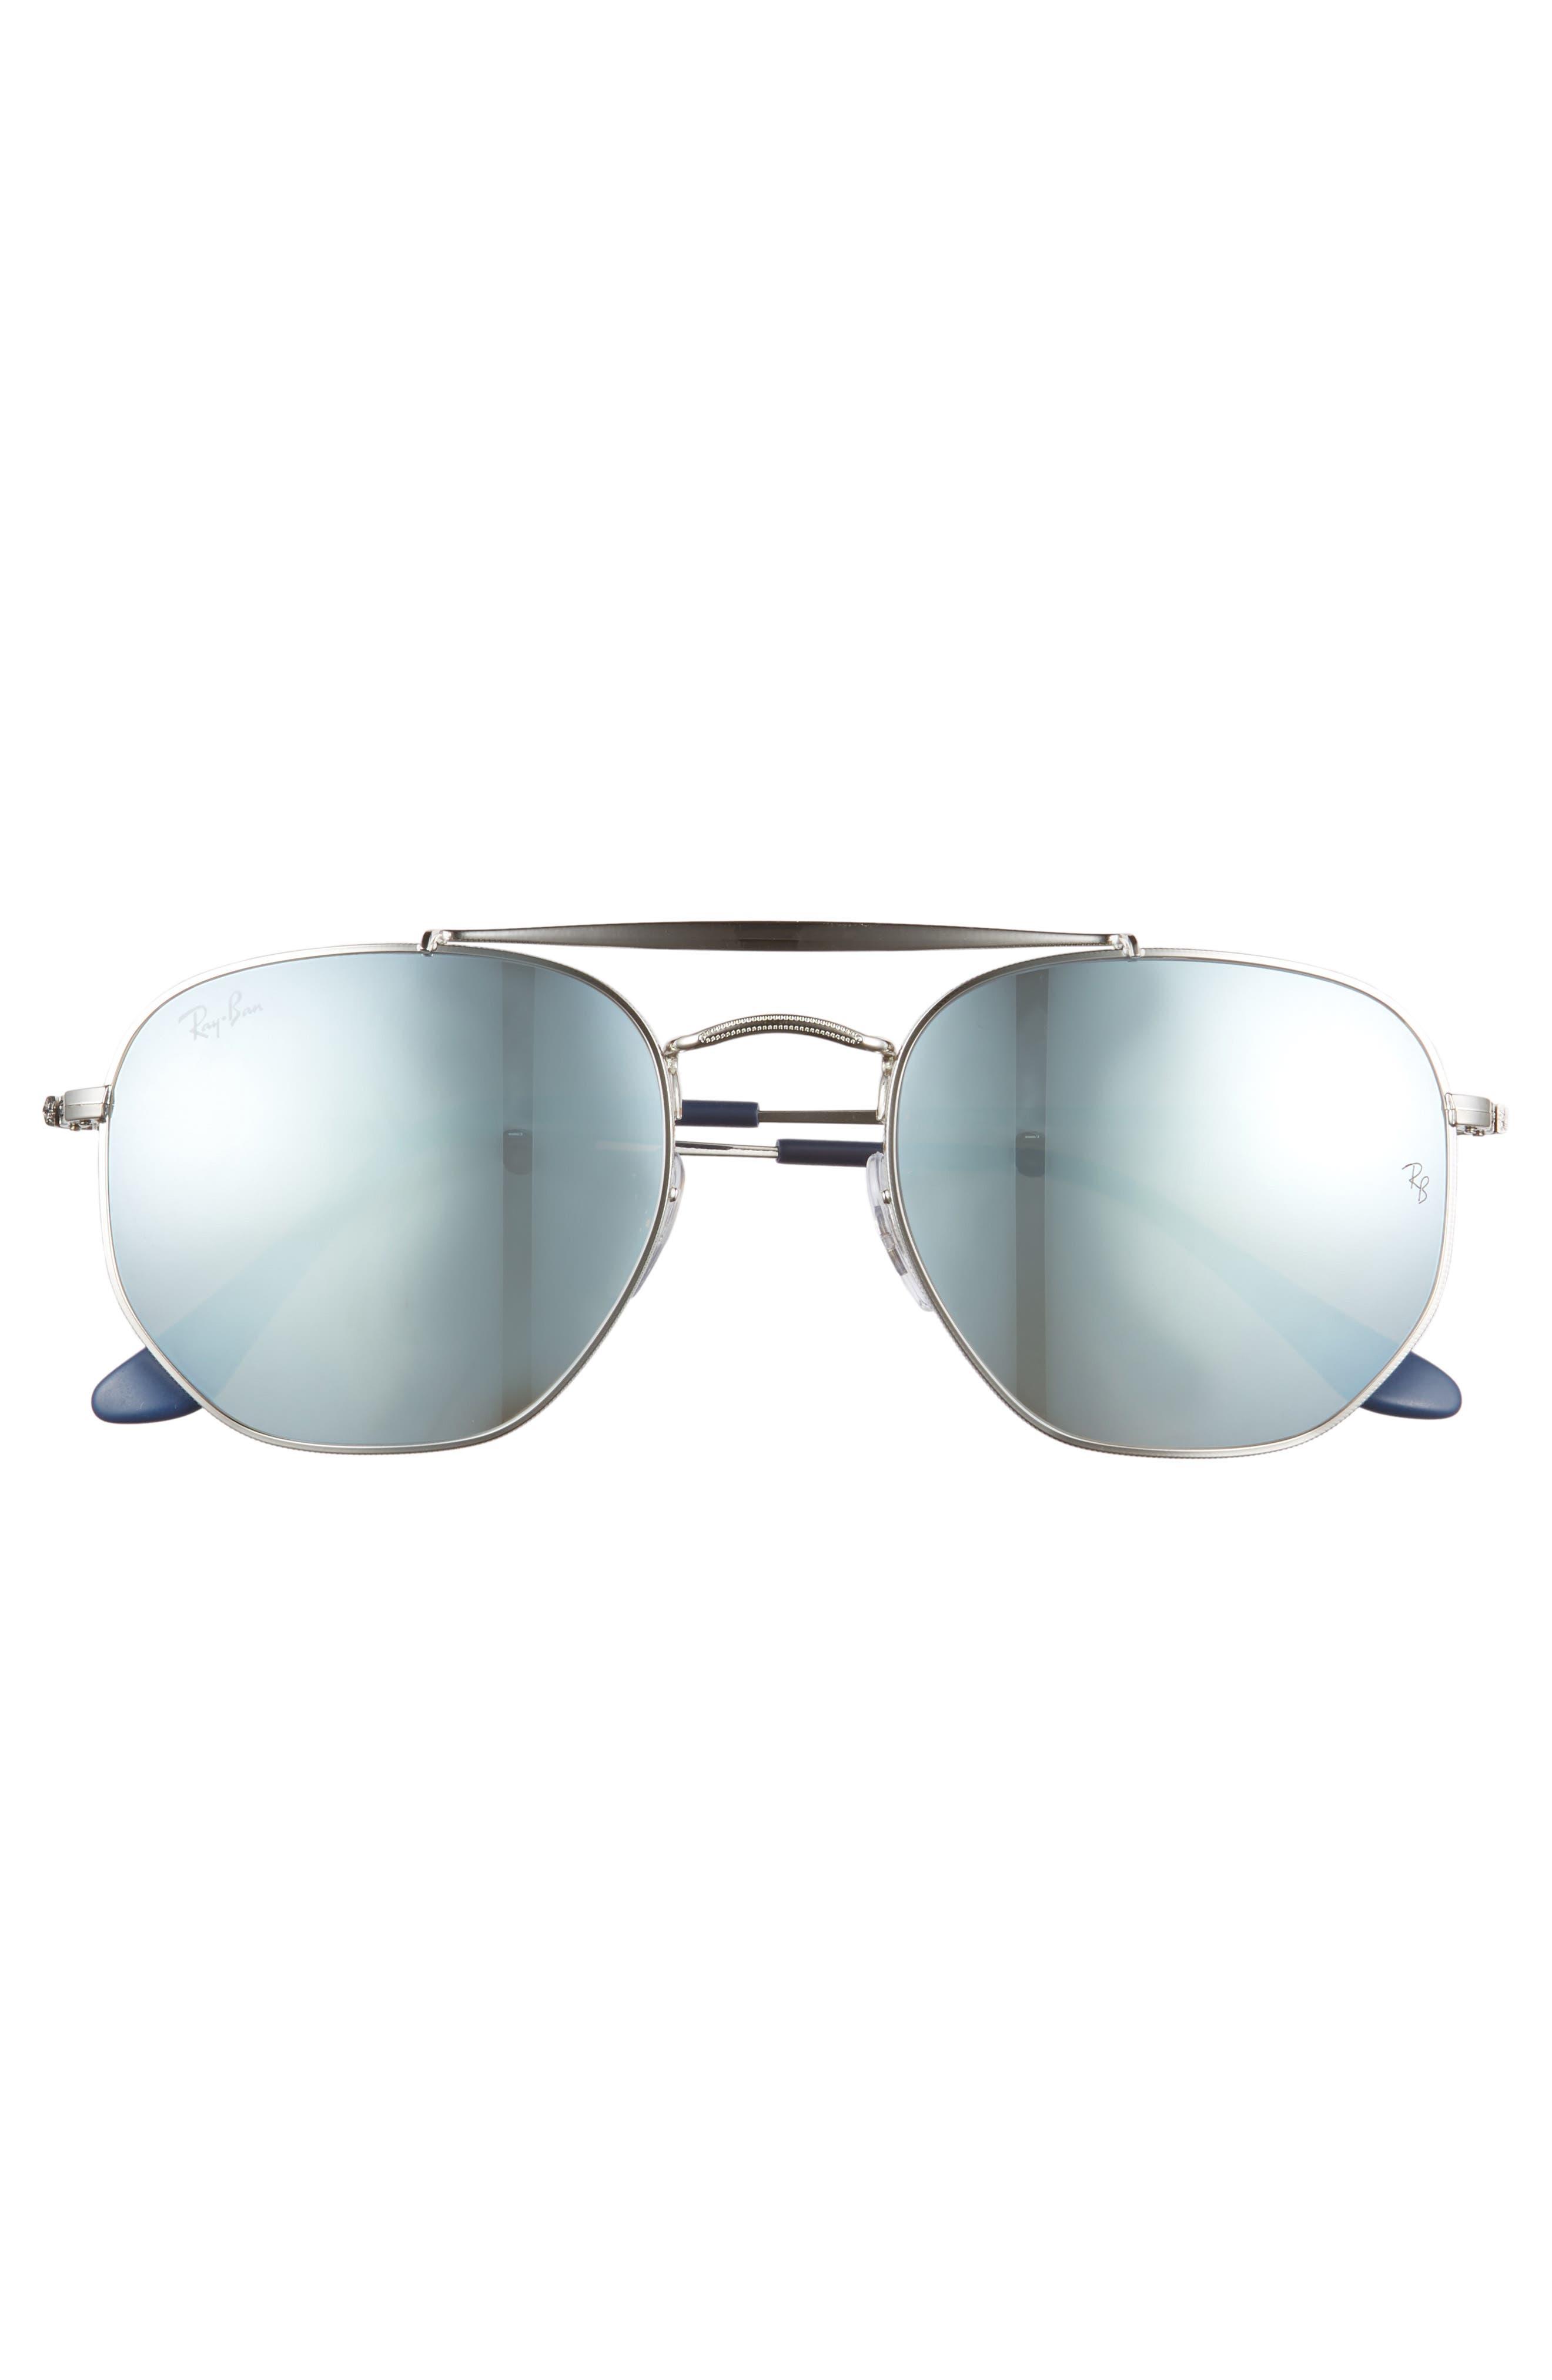 Marshal 54mm Aviator Sunglasses,                             Alternate thumbnail 3, color,                             Silver/ Mirror